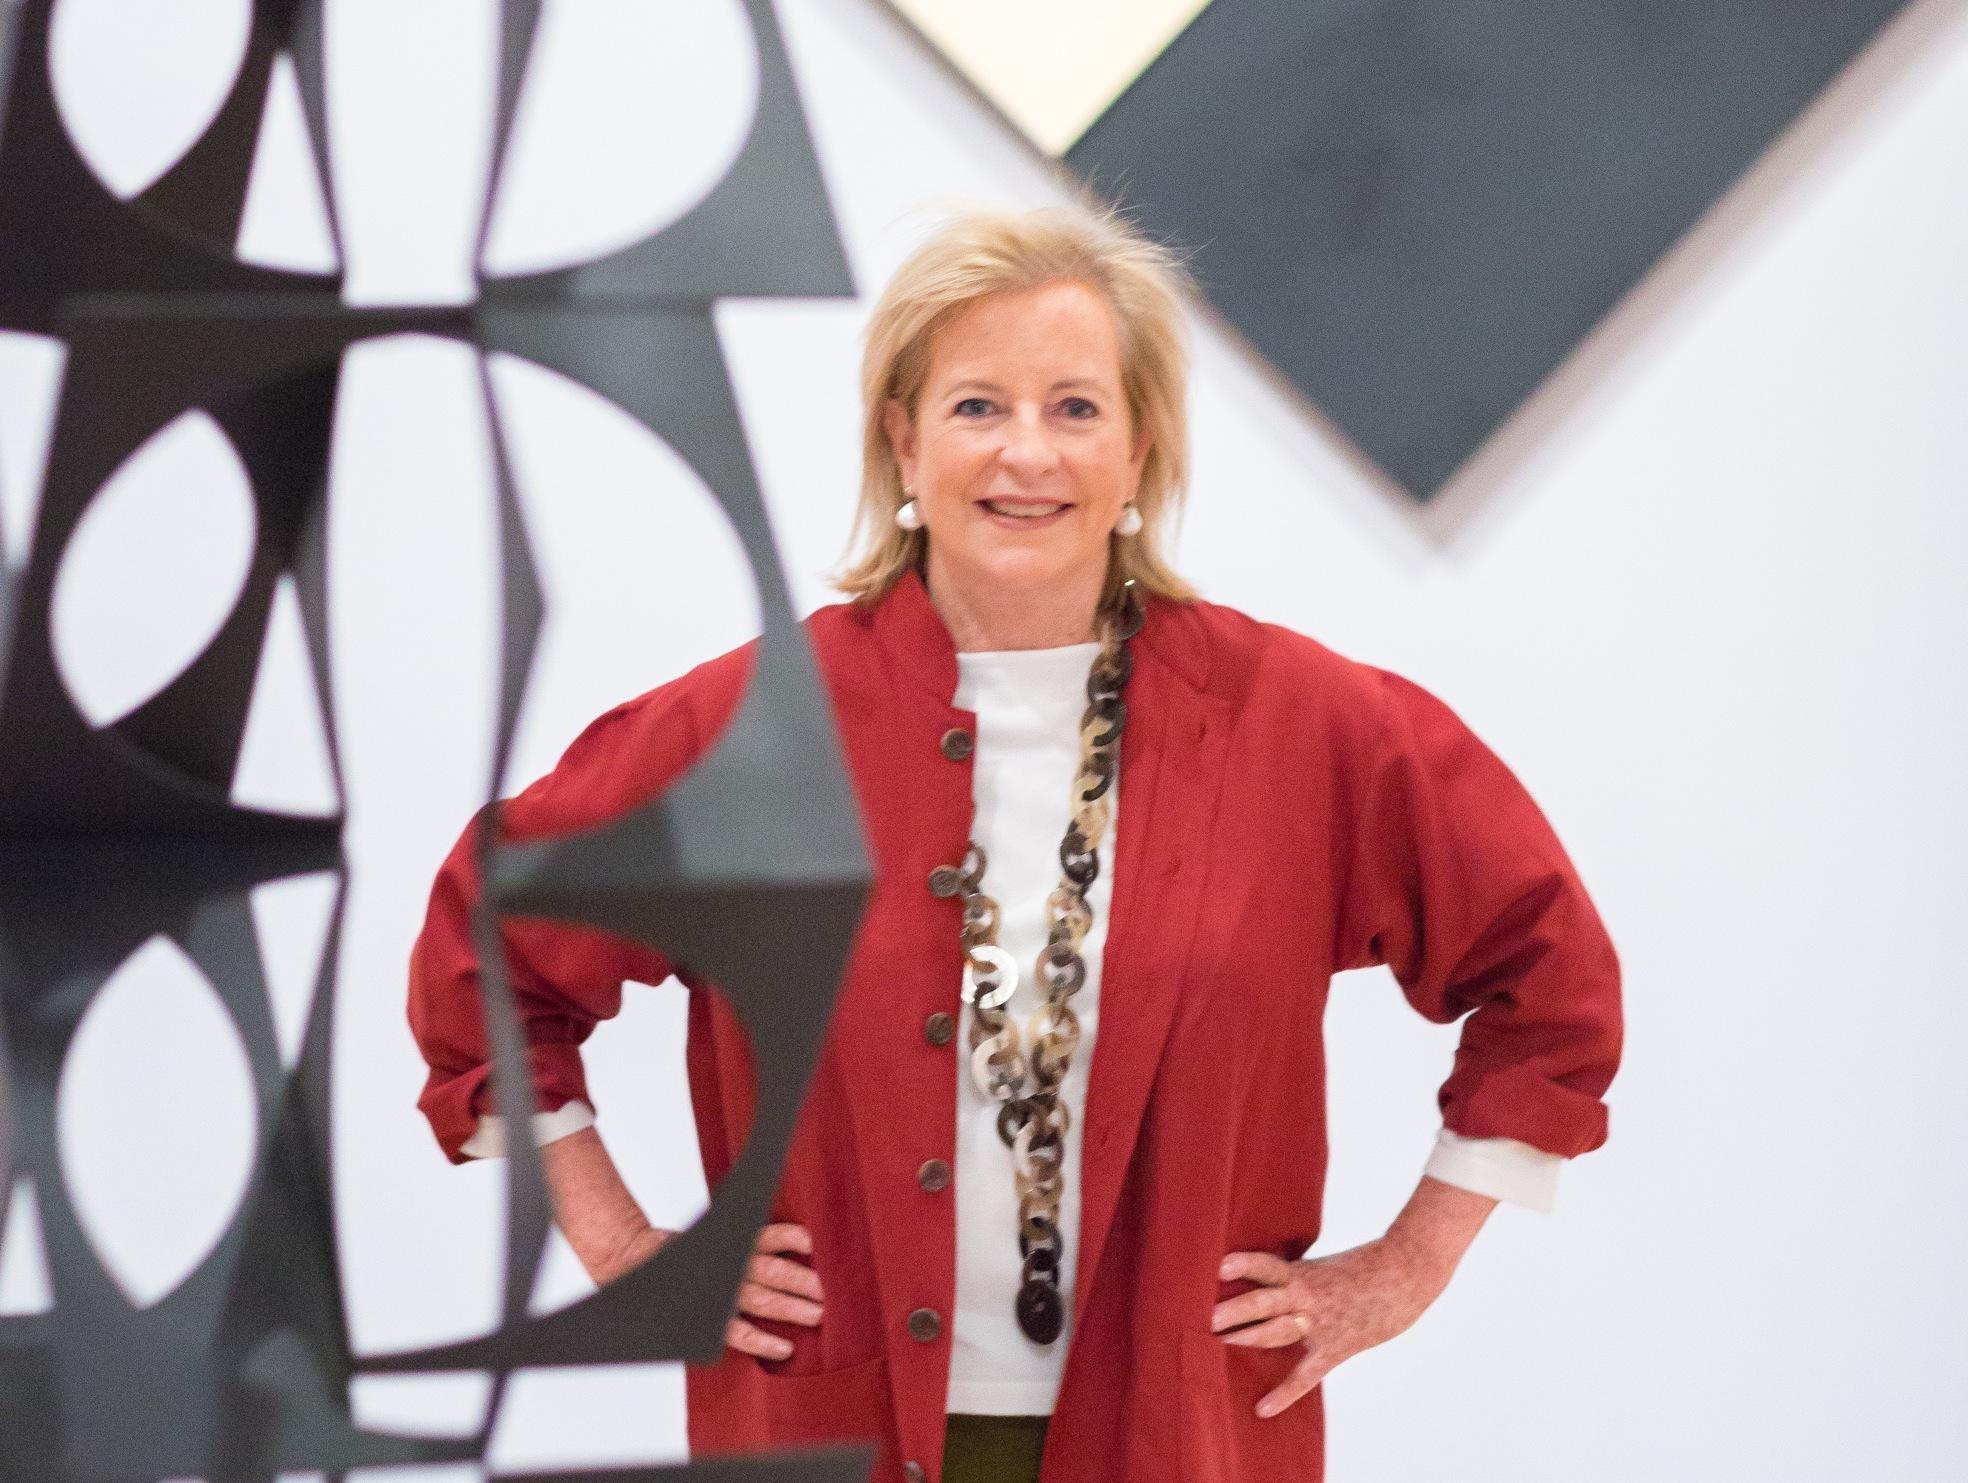 Patricia Phelps de Cisneros